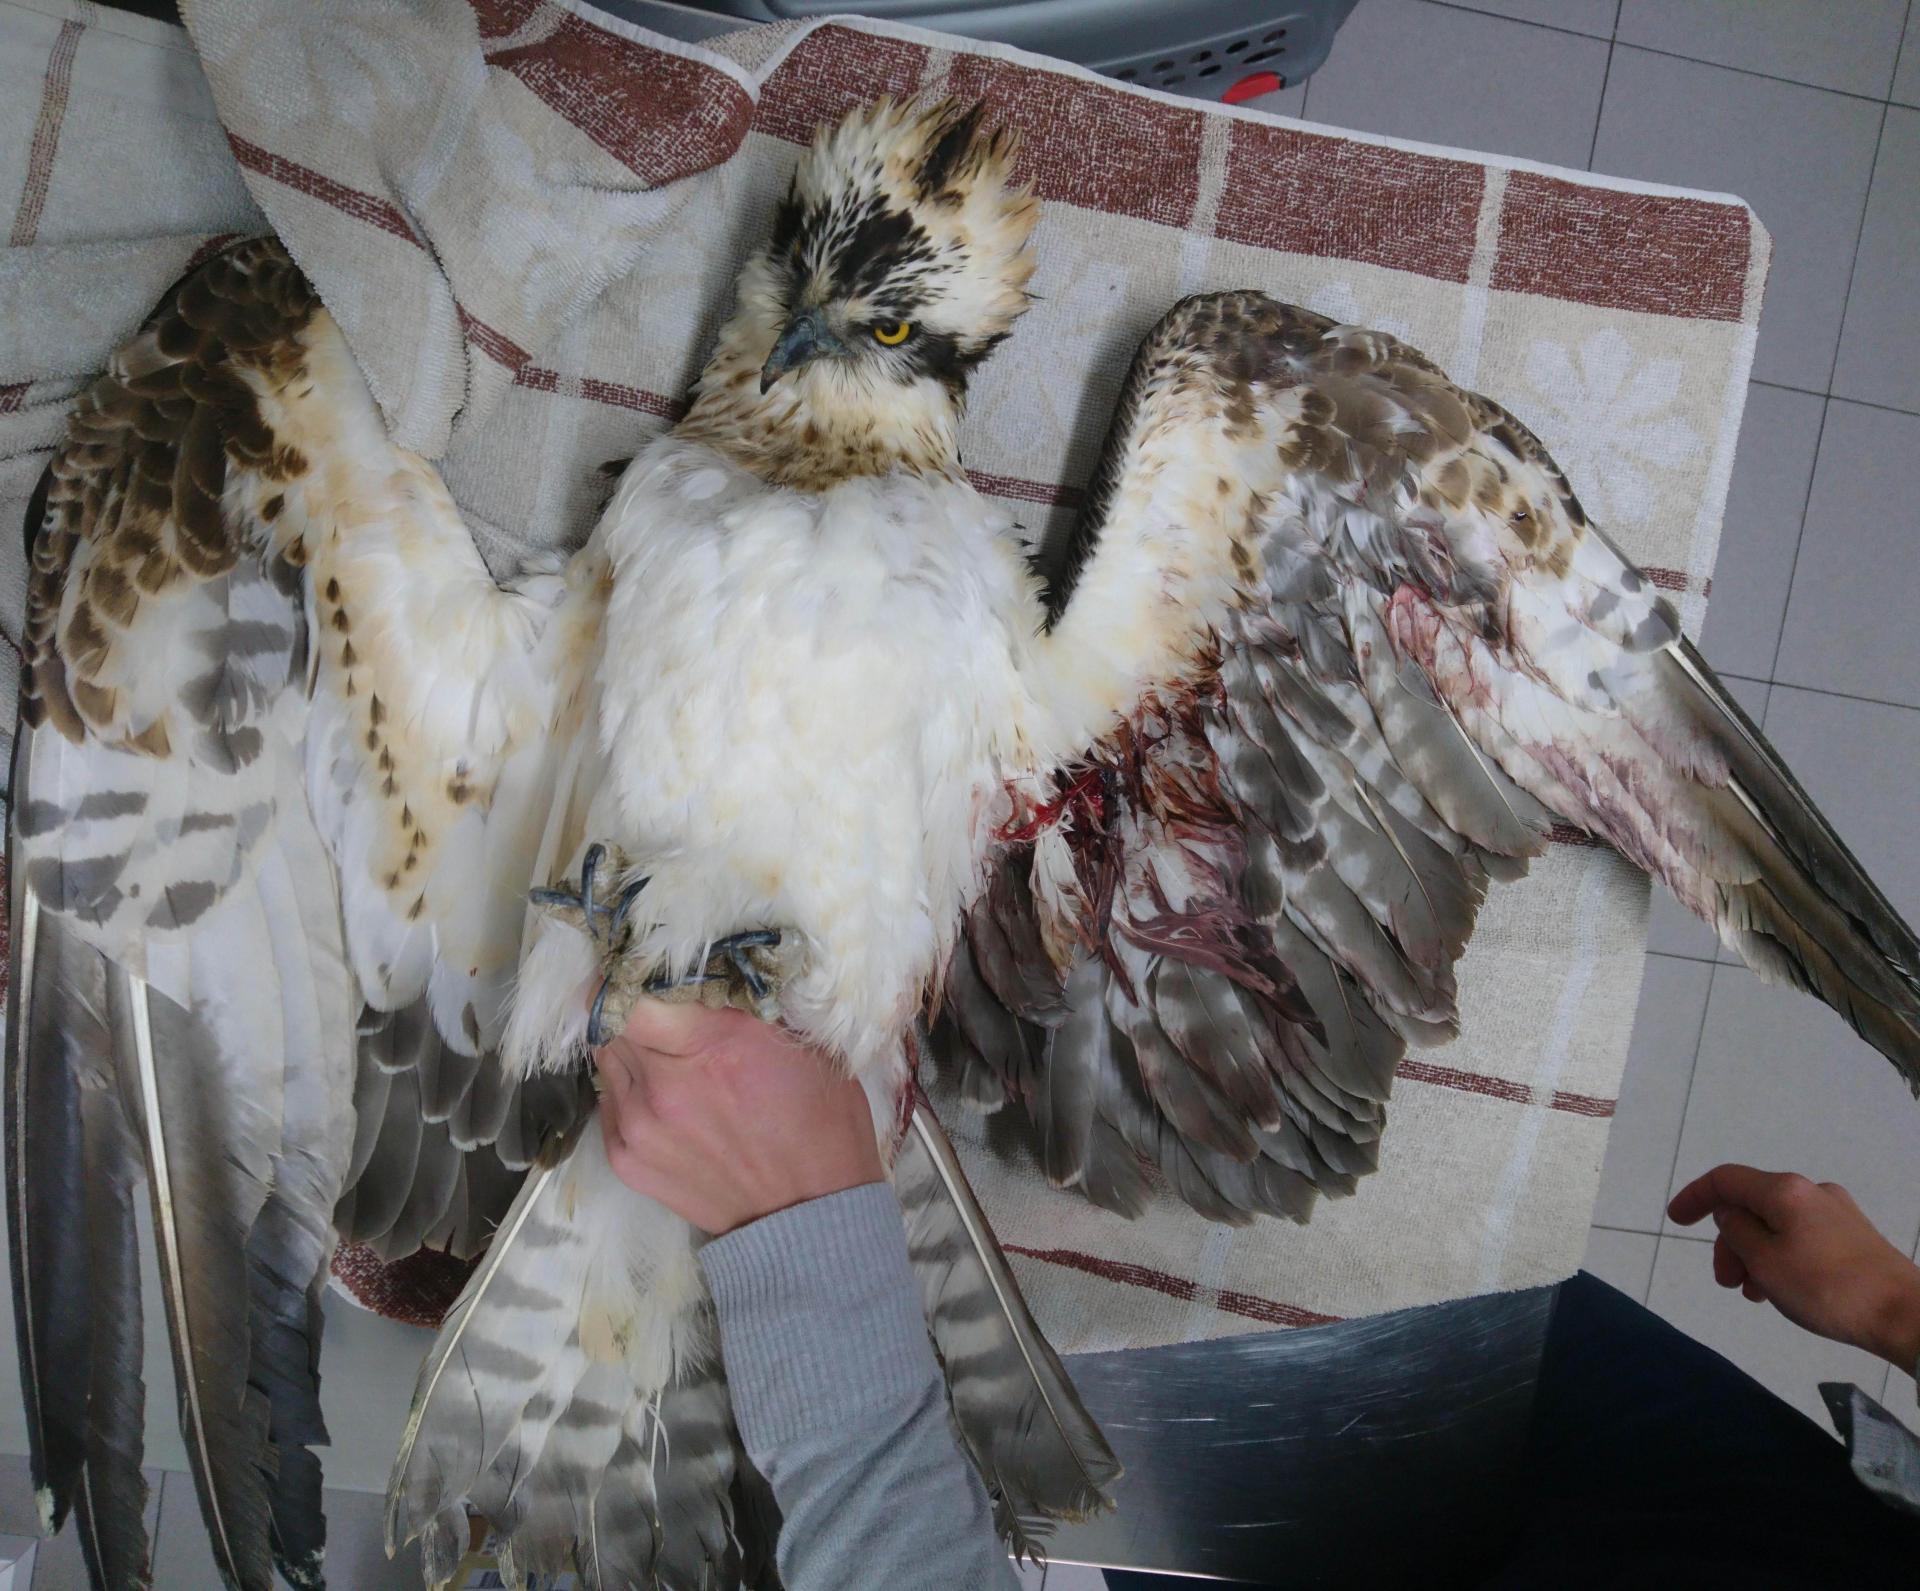 A shot osprey recovered from Xagħra. Photo: Nik Barbara, Birdlife